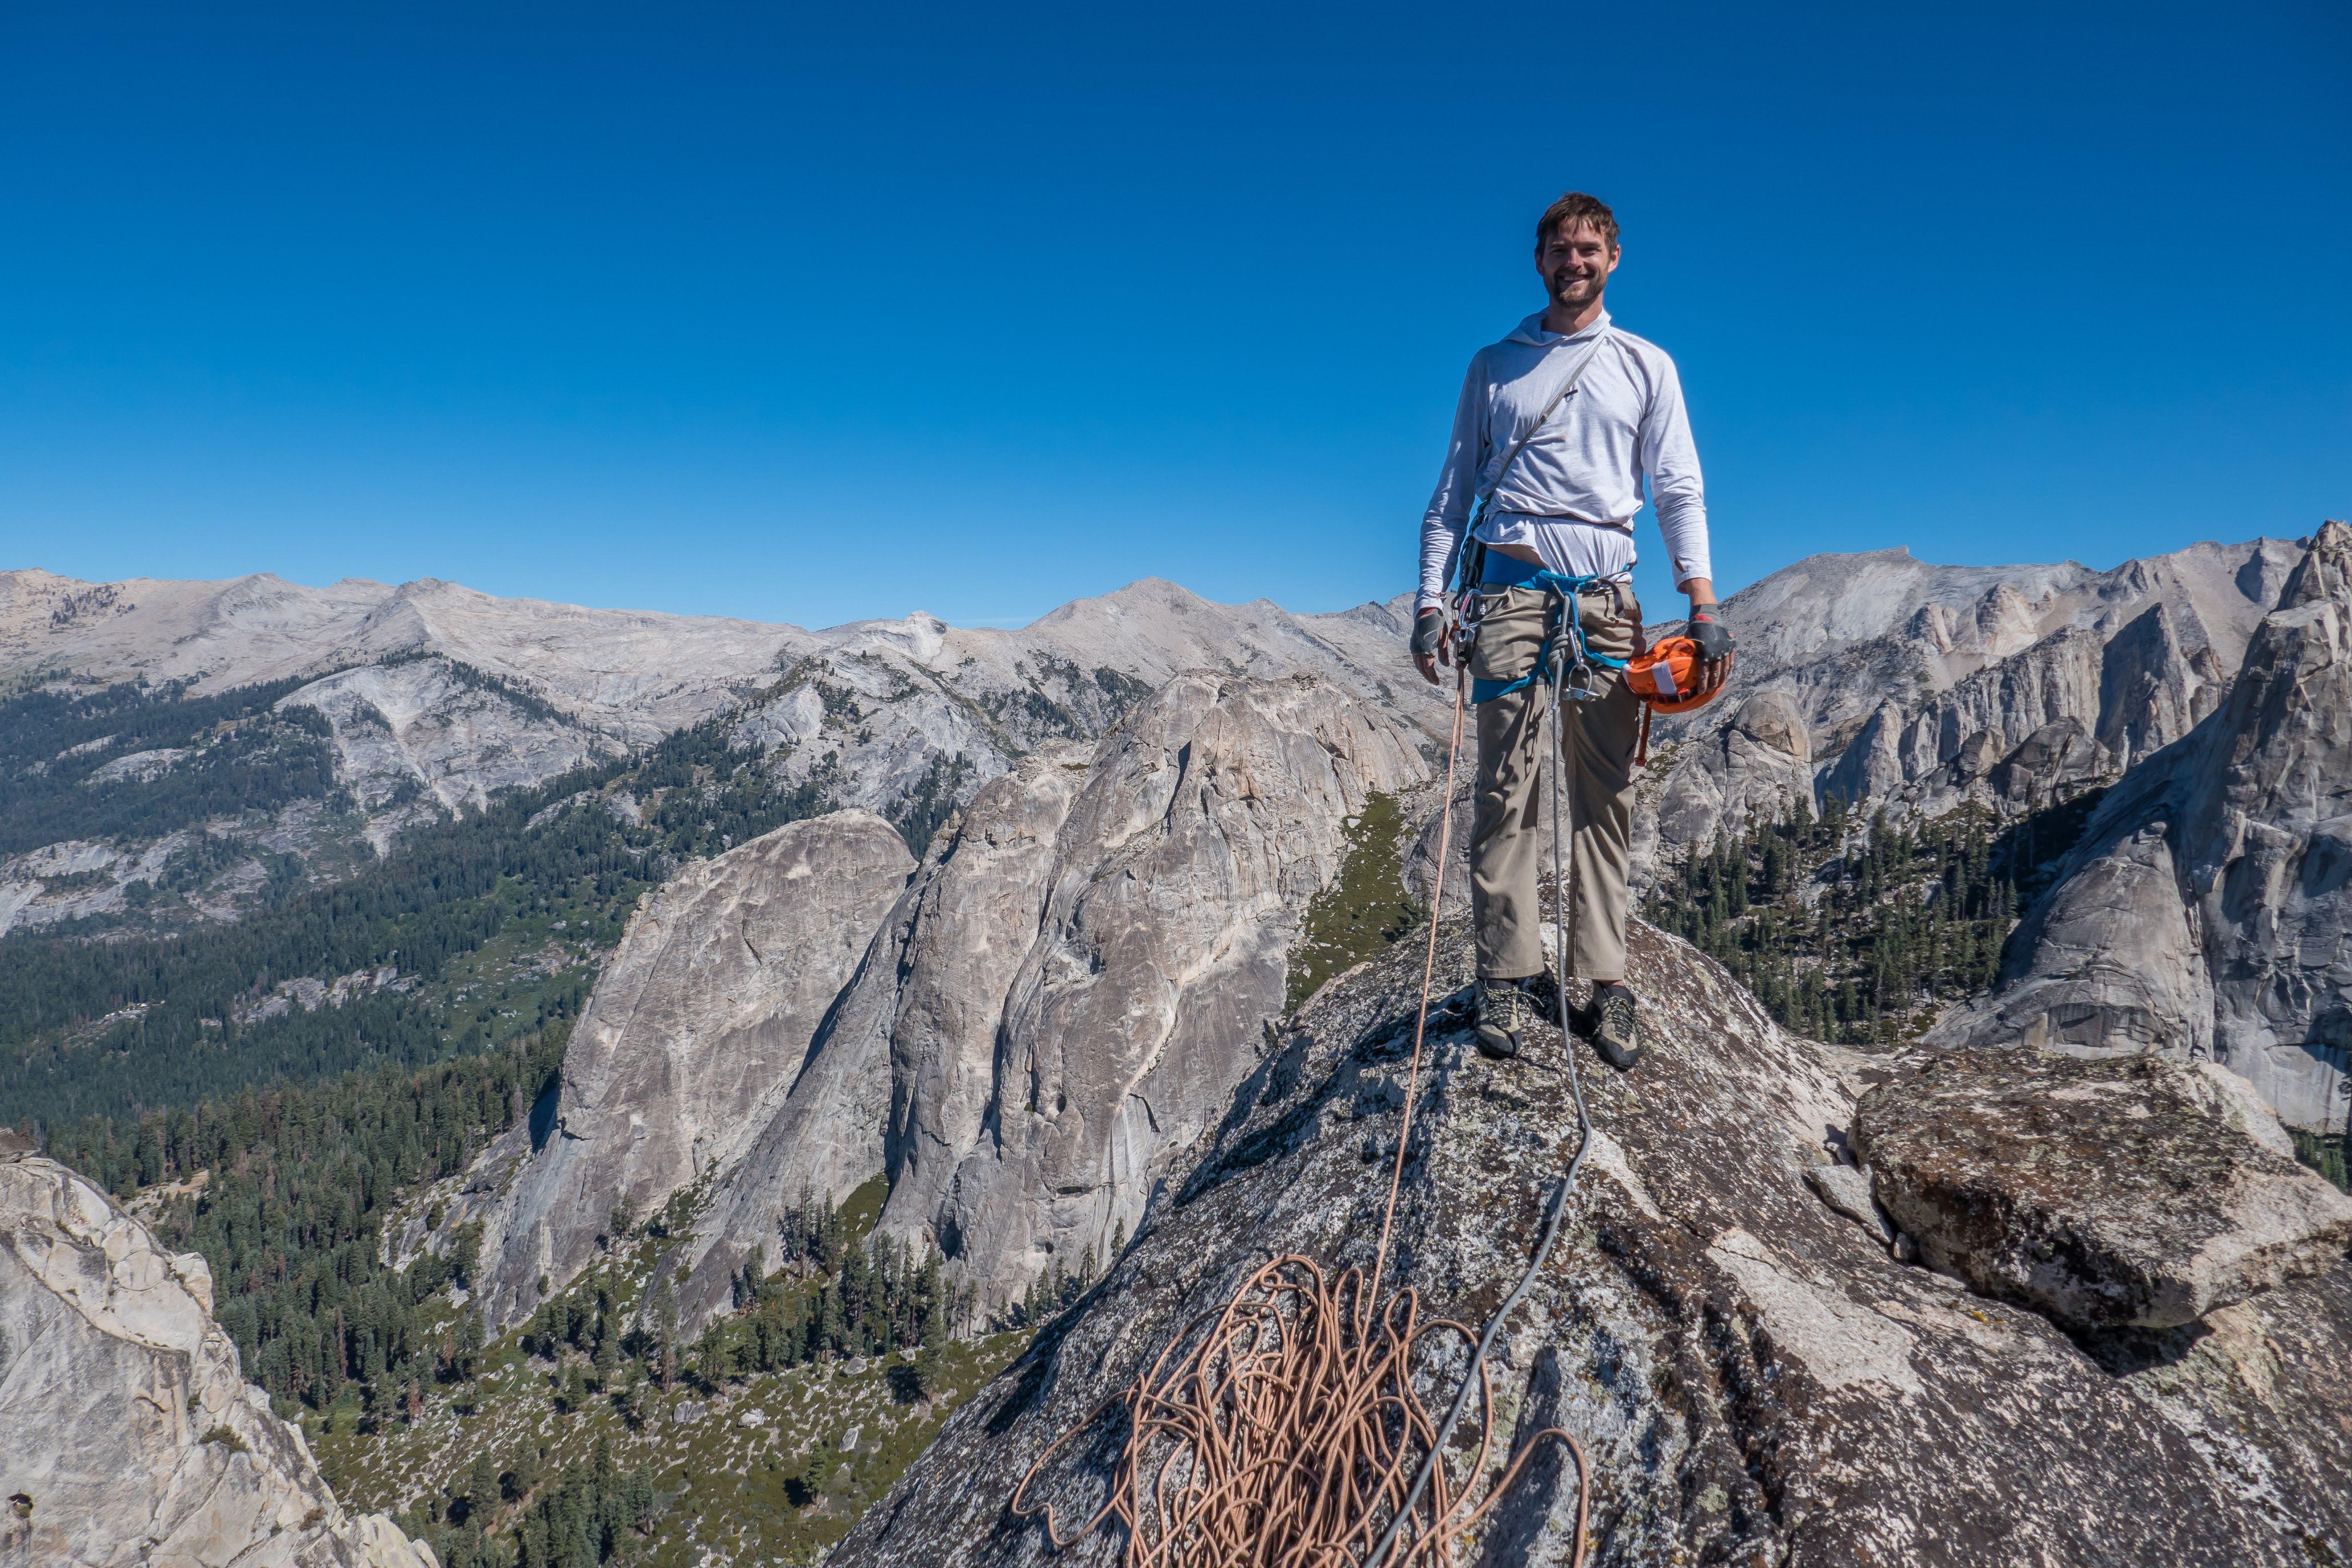 Climbing in the High Sierras